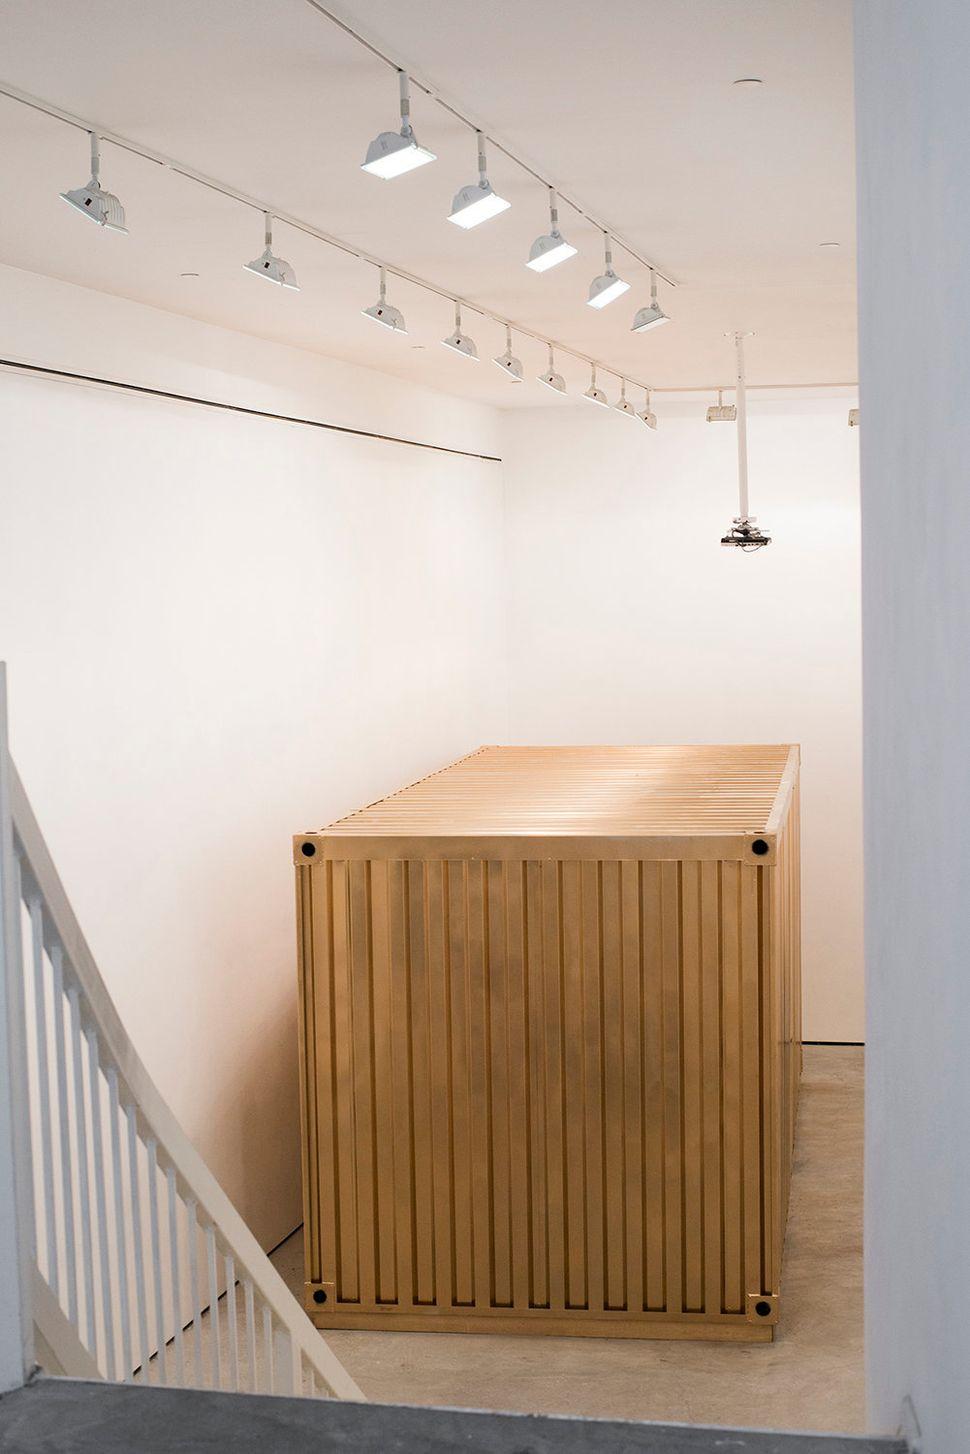 The indoor Portal at the Lu Magnus art gallery in New York City in December 2015